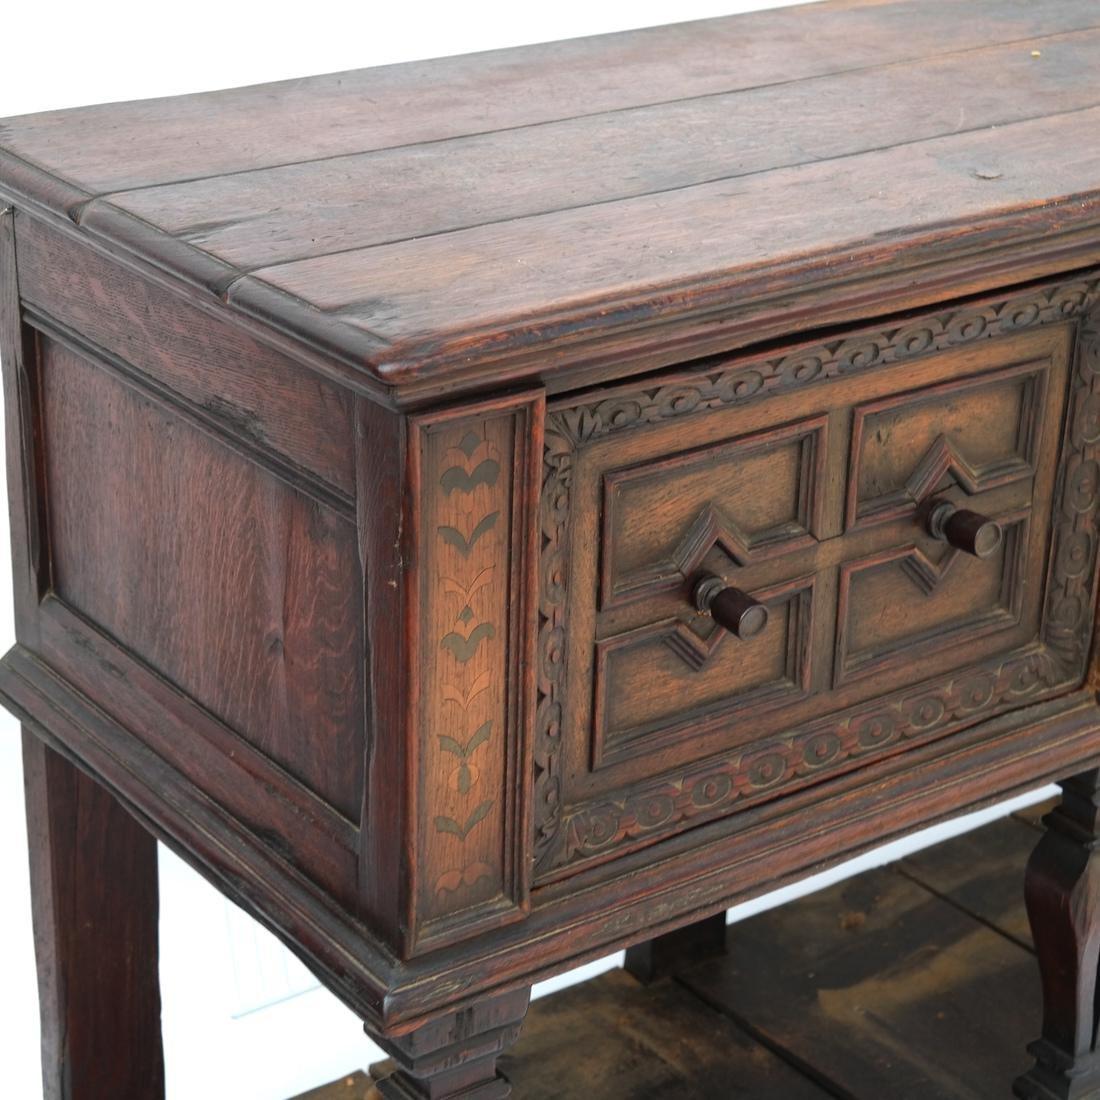 Jacobean-Style Inlaid Oak Sideboard - 2